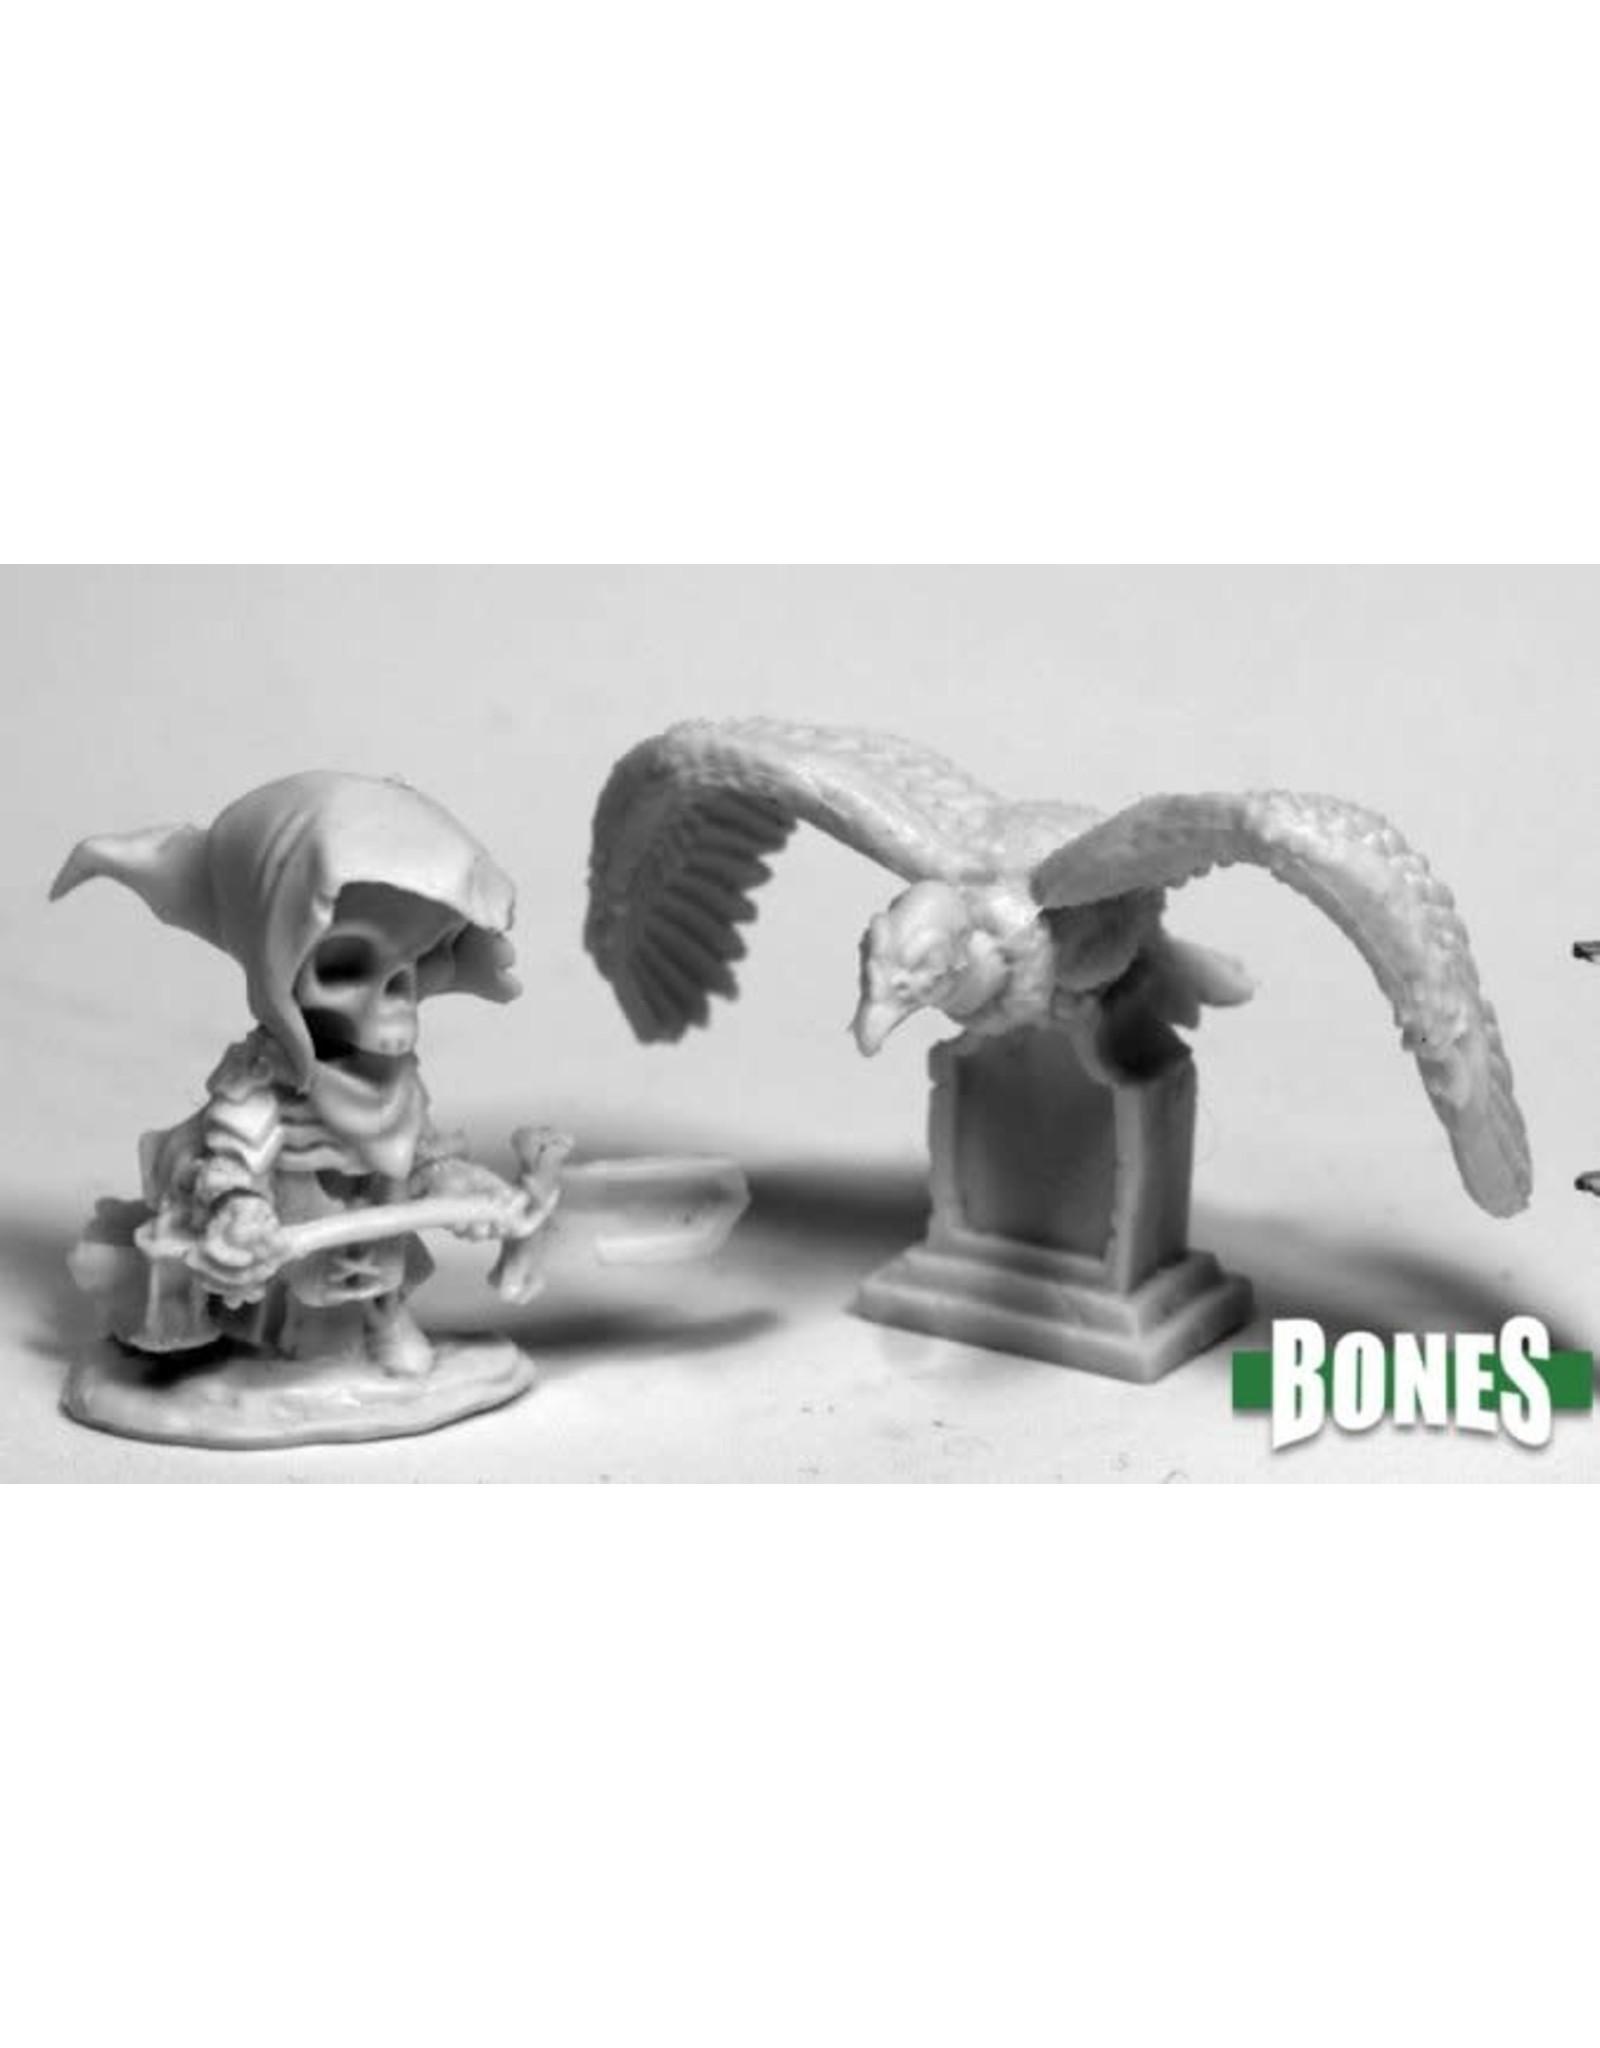 Reaper Miniatures Bones Mr. Bones & Buzzy